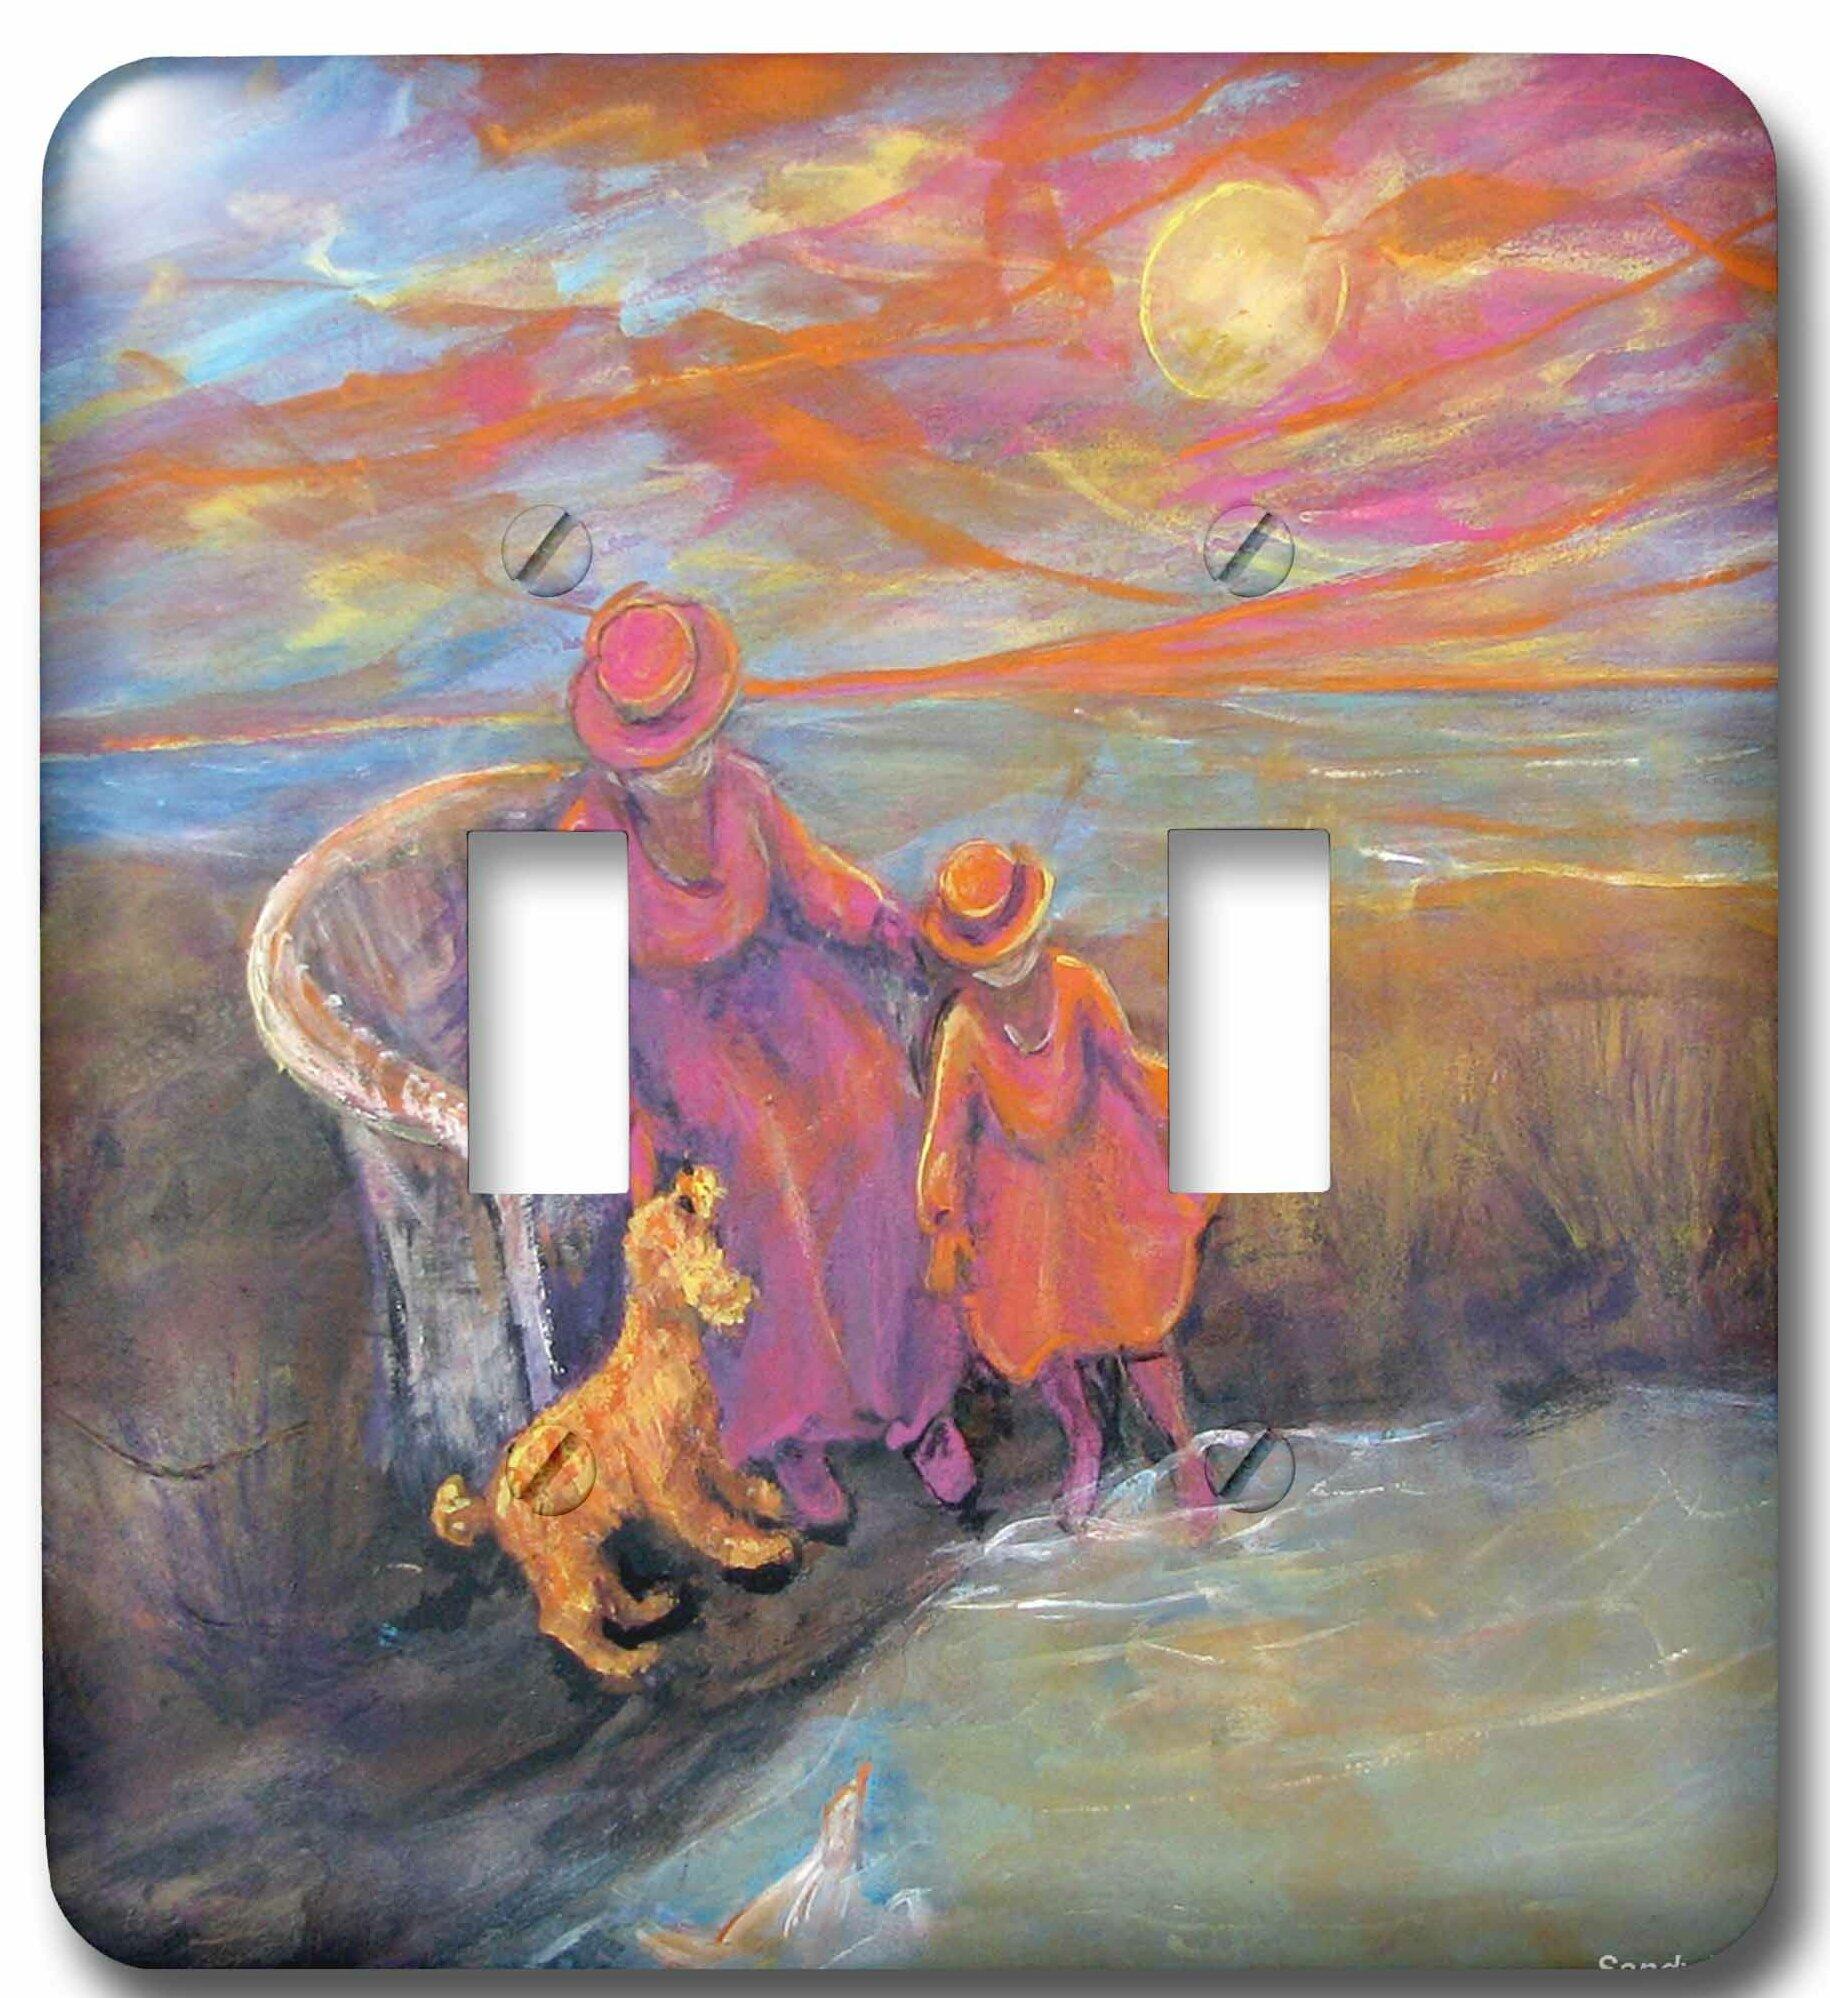 3drose Sun Kissed Memories Seaside Sunset Frames Grandma Granddaughter Pet Puppy 2 Gang Toggle Light Switch Wall Plate Wayfair